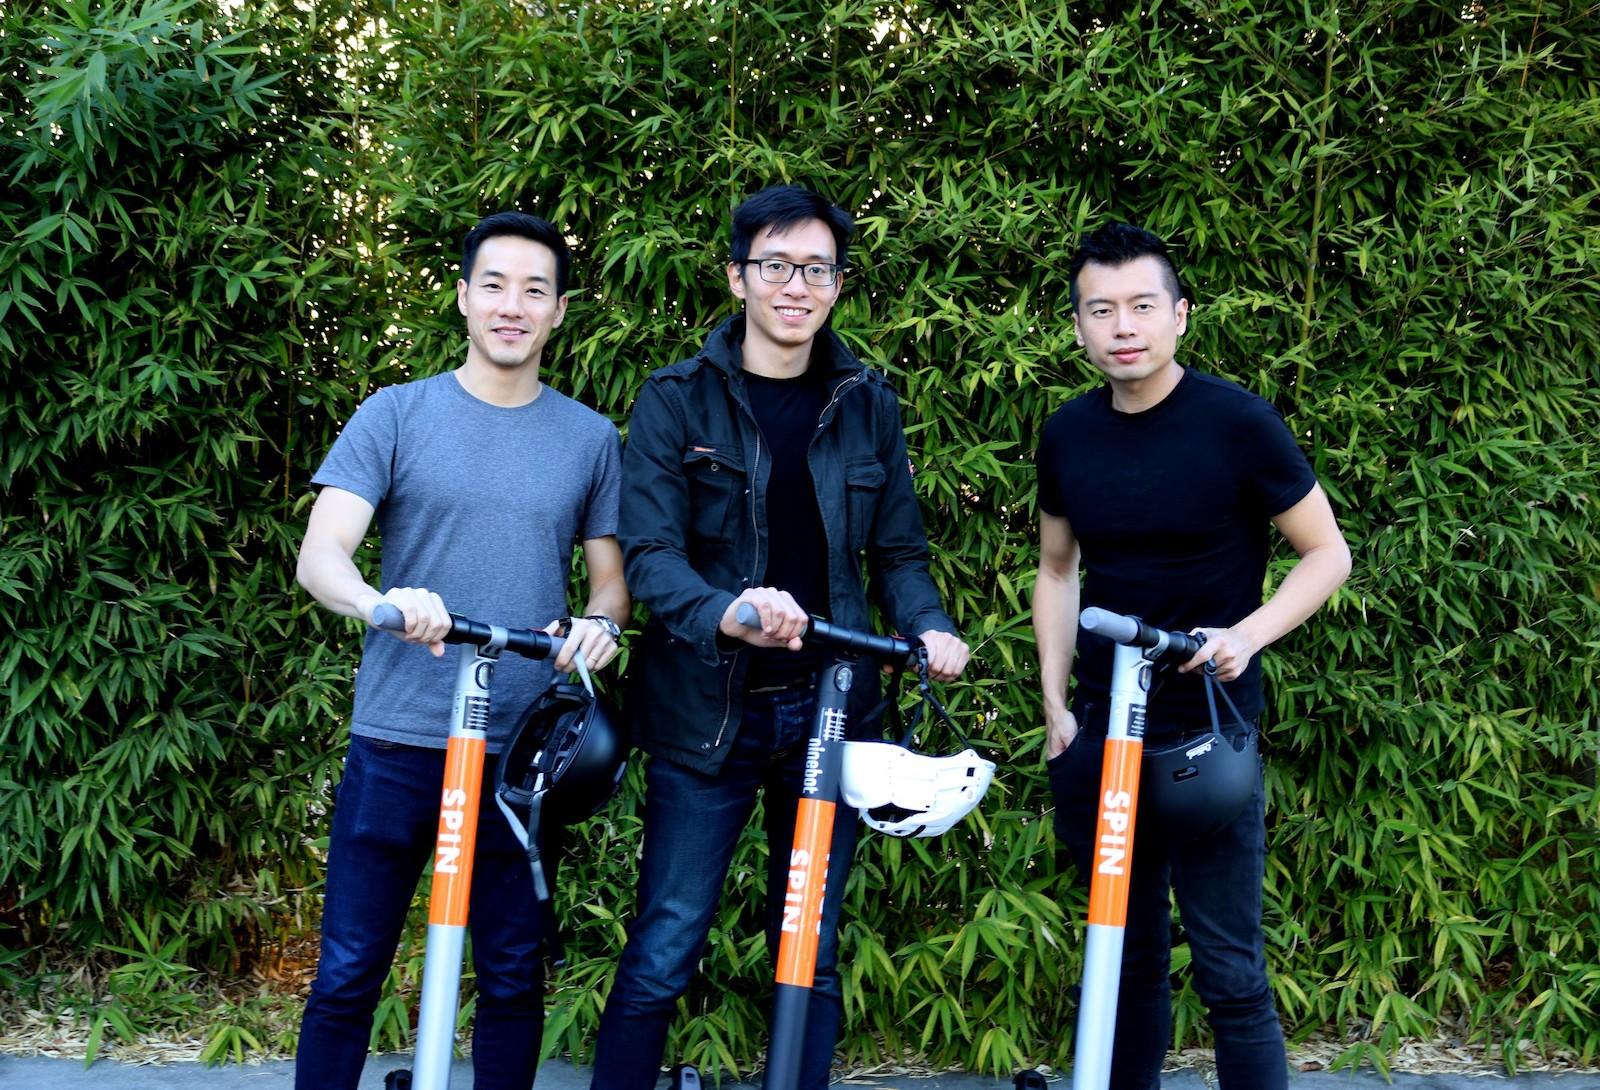 Zakladatelé Spinu Zaizhuang Cheng, Derrick Ko a Euwyn Poon